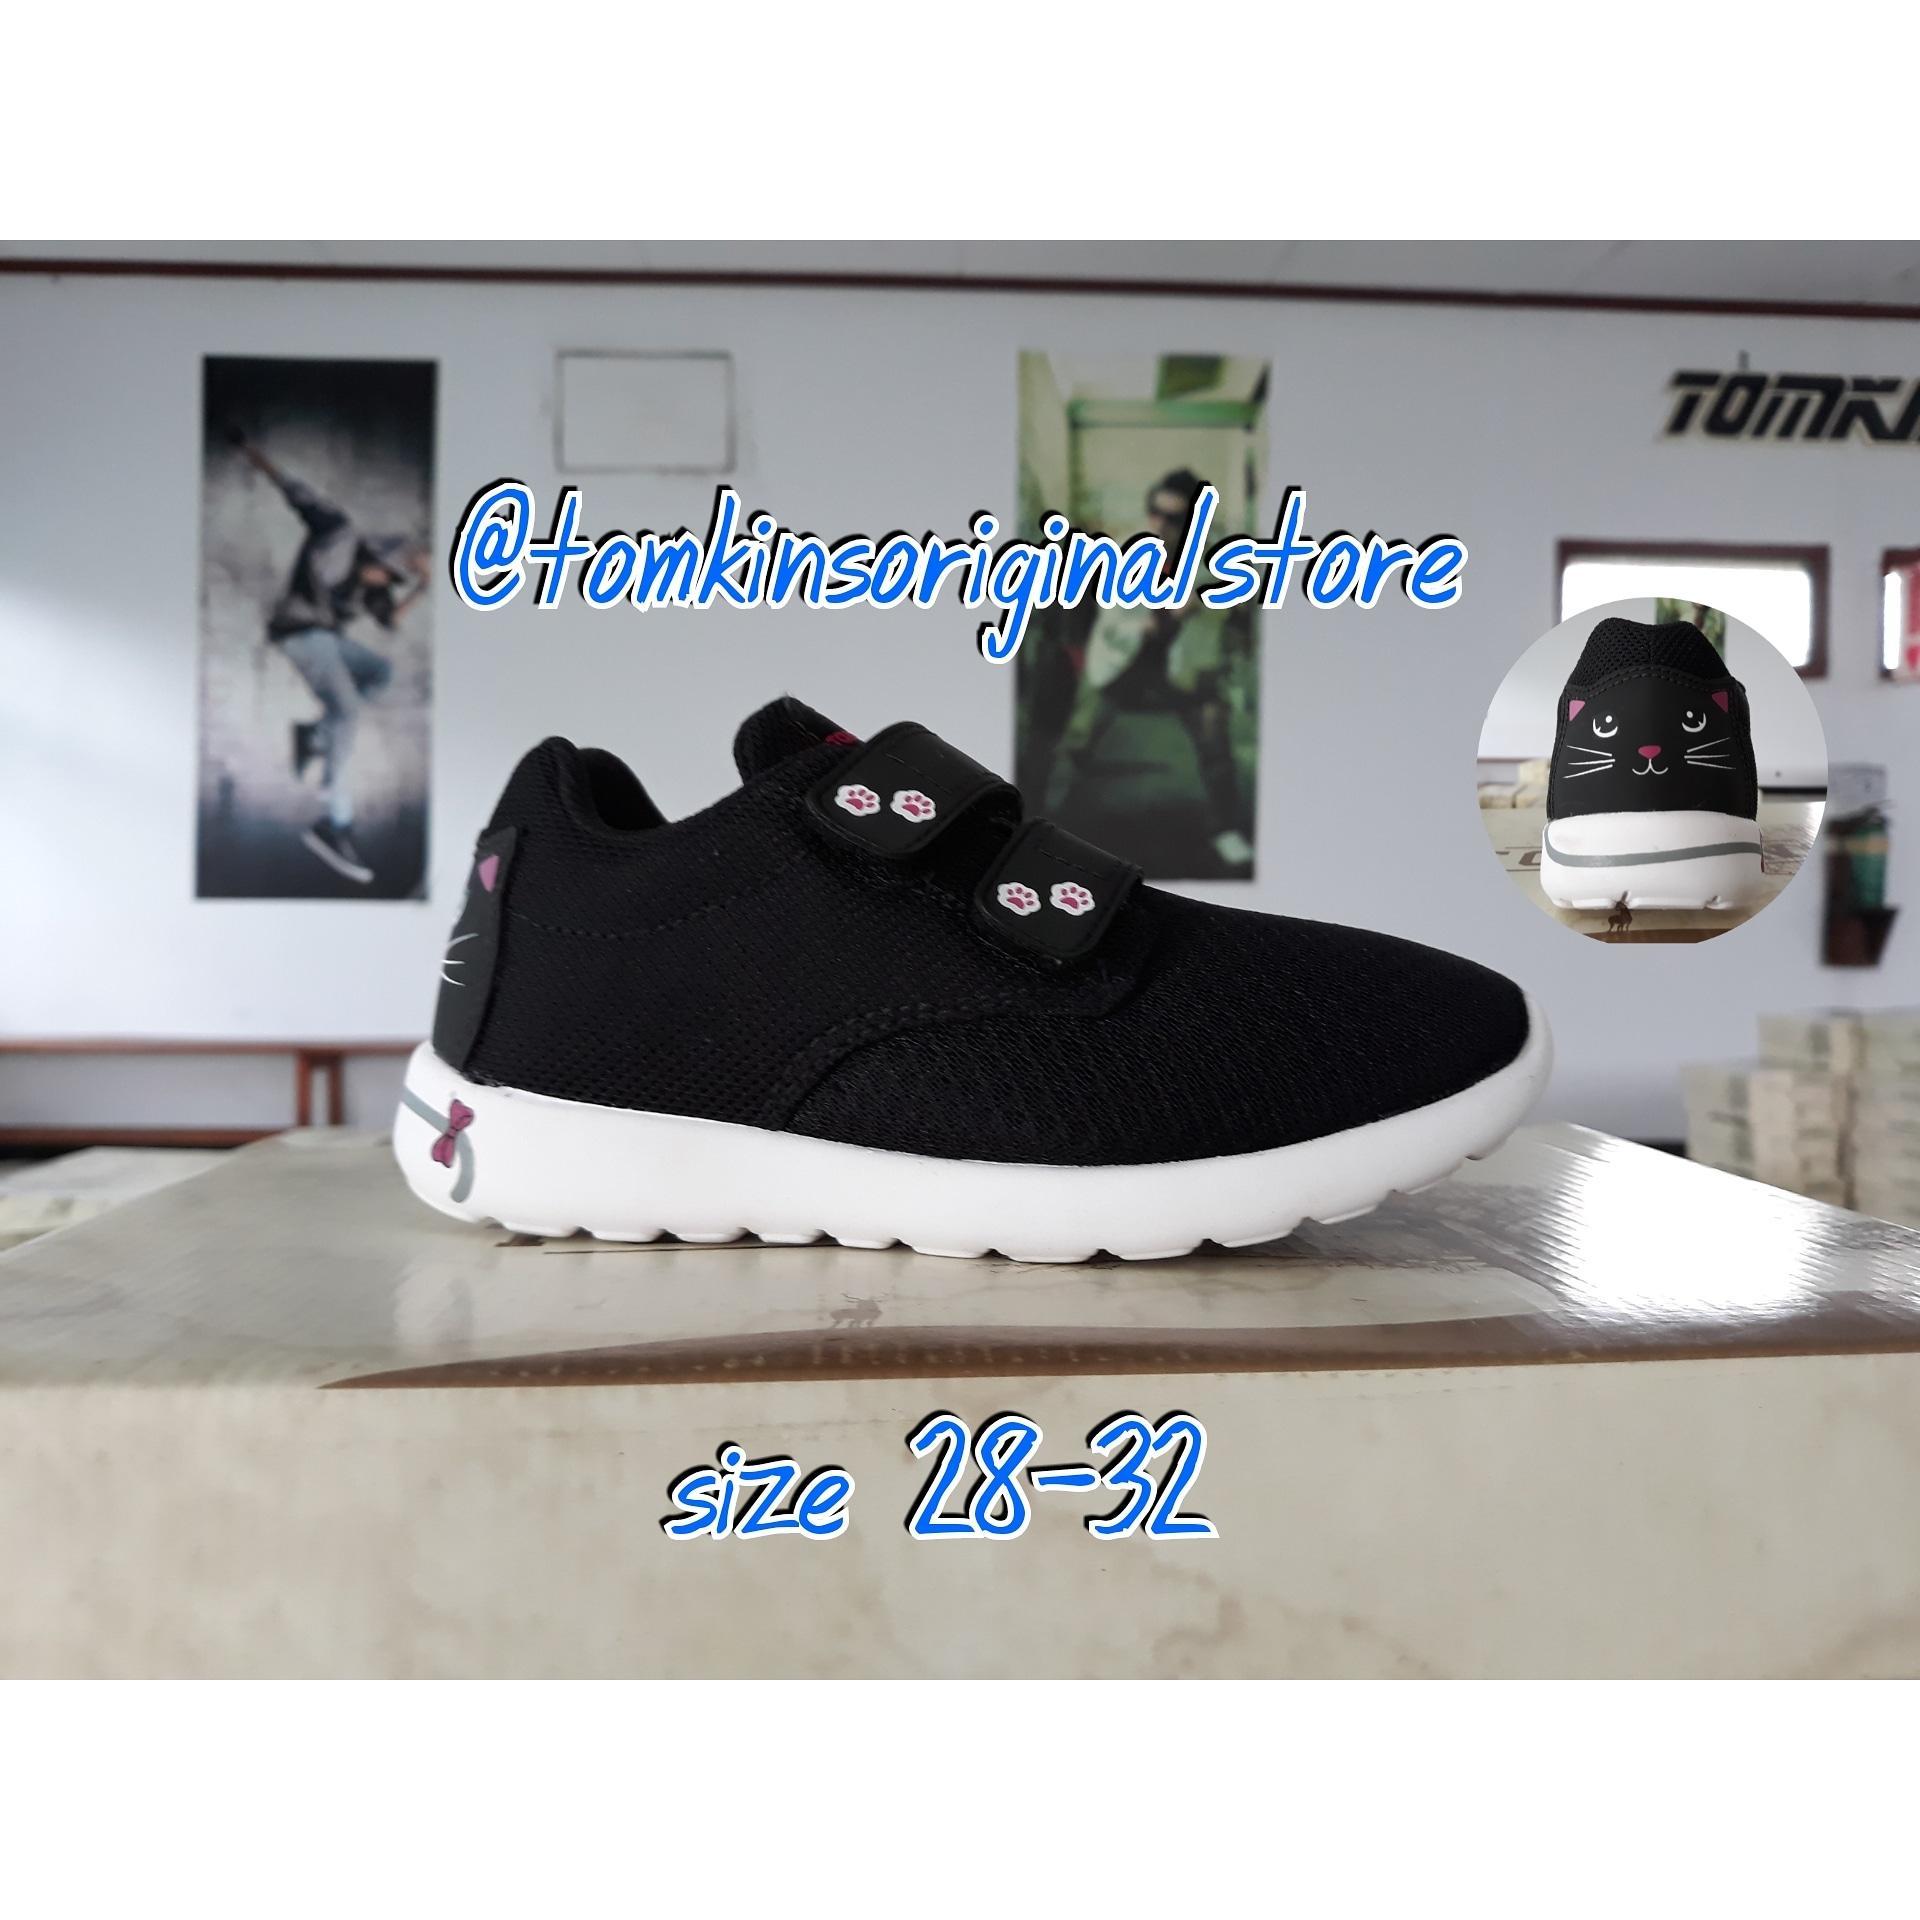 Sepatu Tomkins Terbaru   Terlengkap  551b32a68a